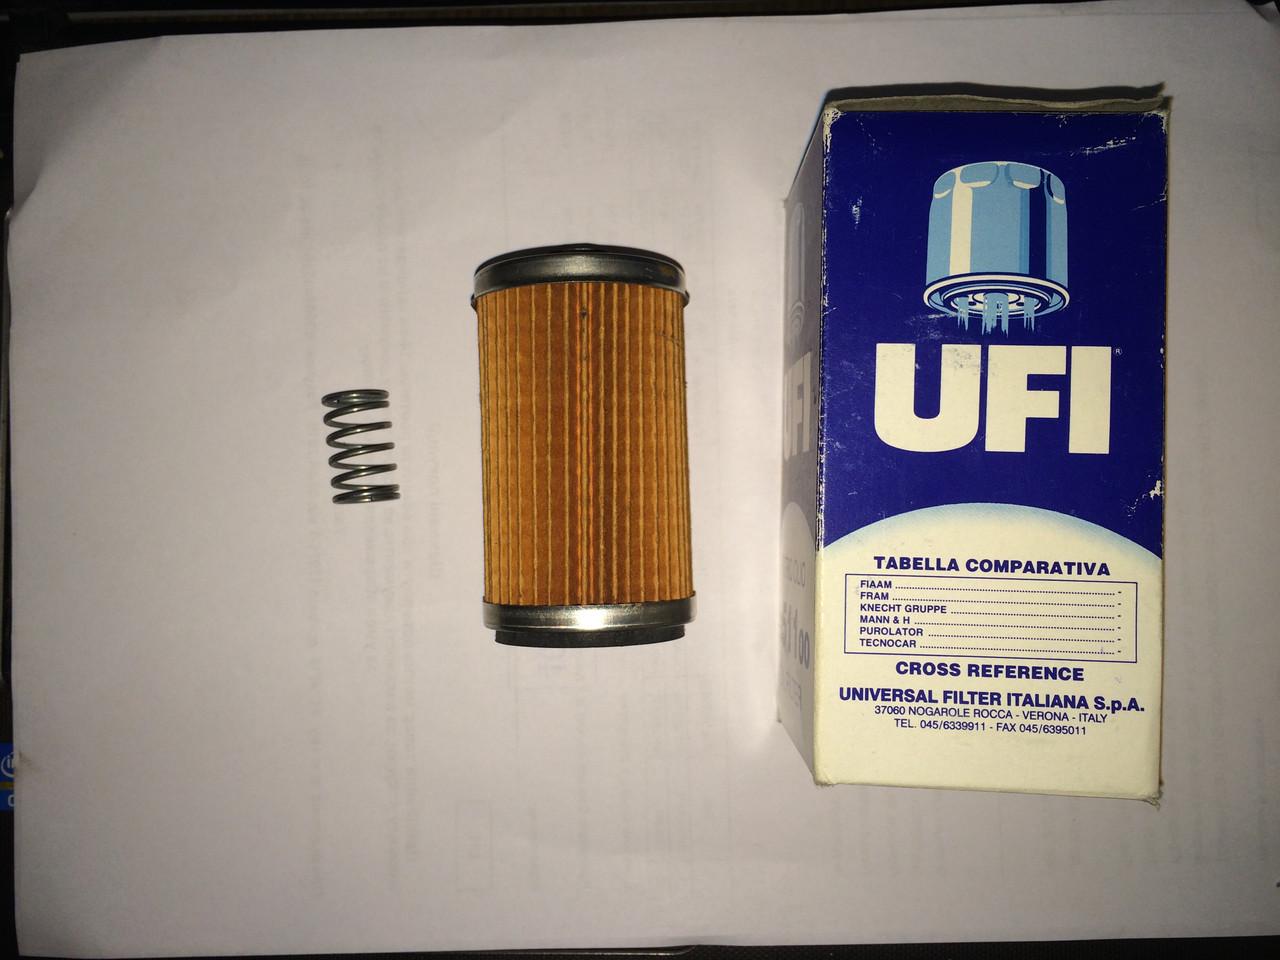 Фильтр гидроусилителя Fiat Ducato, Croma, Lancia Ufi 25.511.00